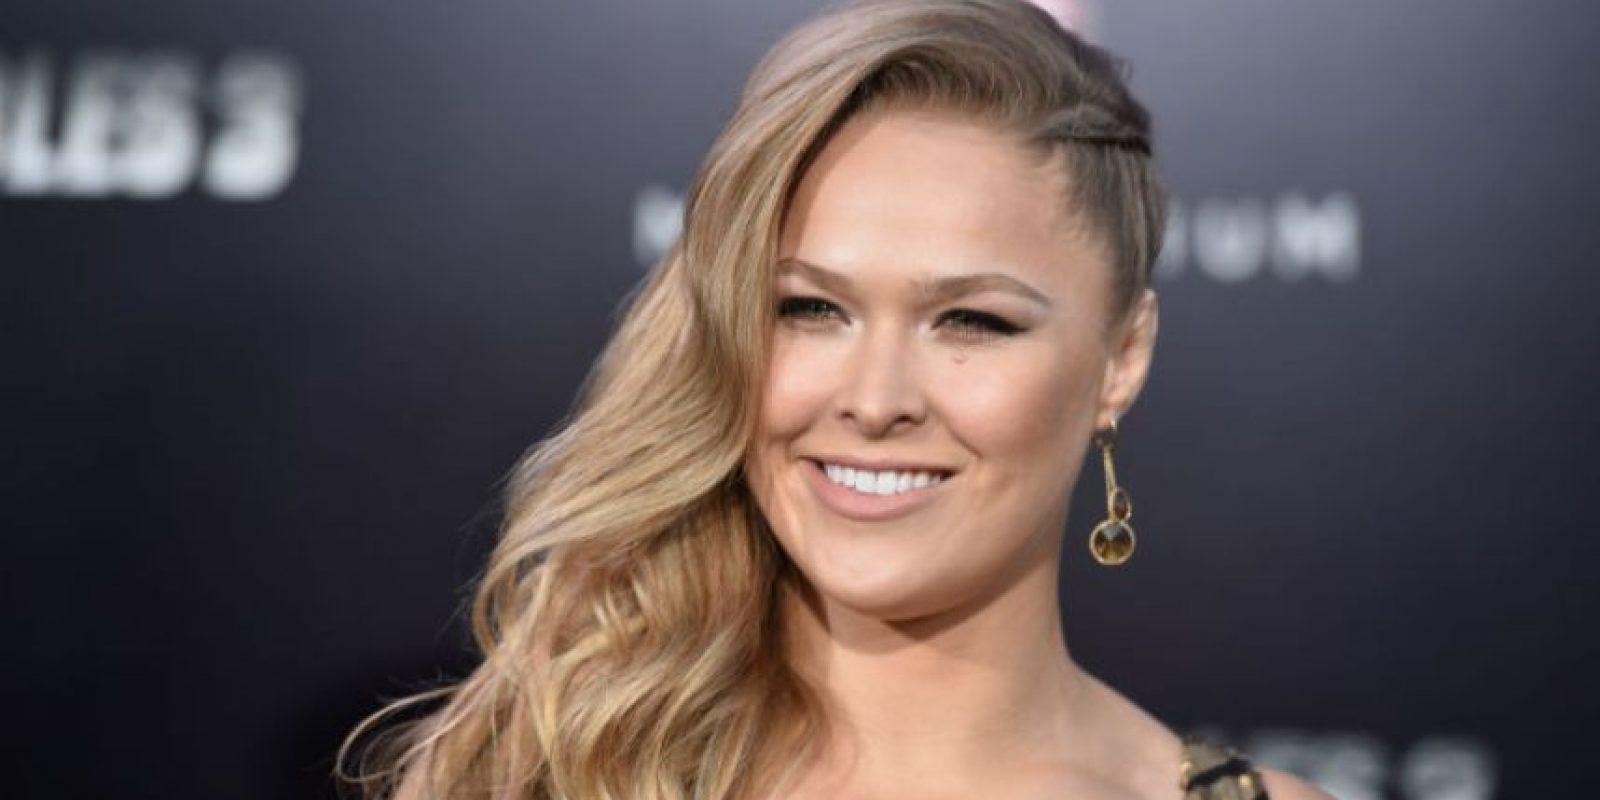 Así luce Ronda Rousey regularmente Foto:Vía instagram.com/rondarousey